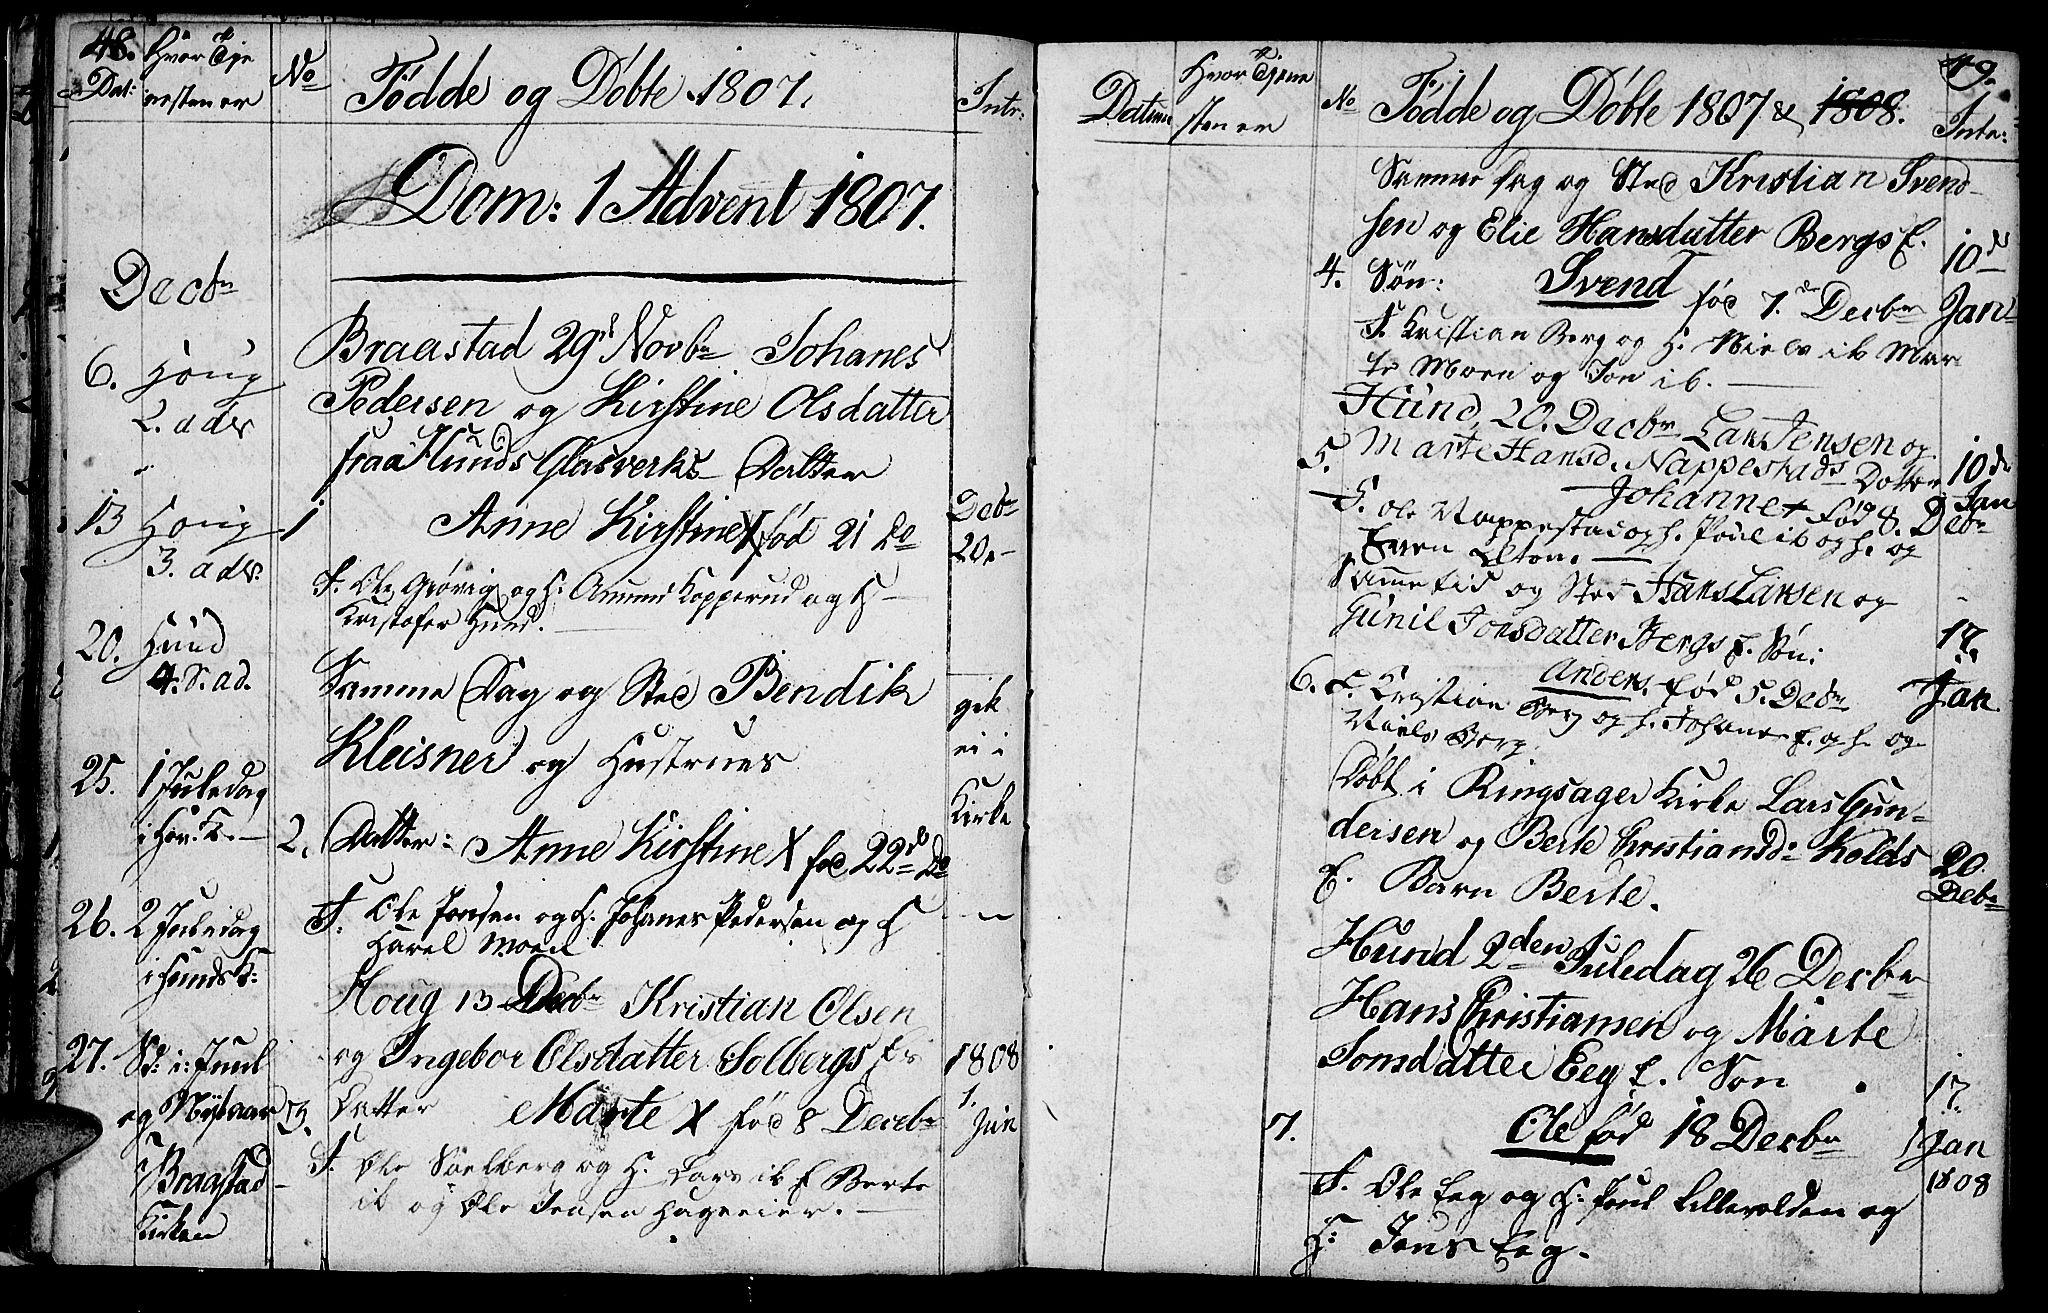 SAH, Vardal prestekontor, H/Ha/Hab/L0003: Klokkerbok nr. 3, 1803-1808, s. 48-49